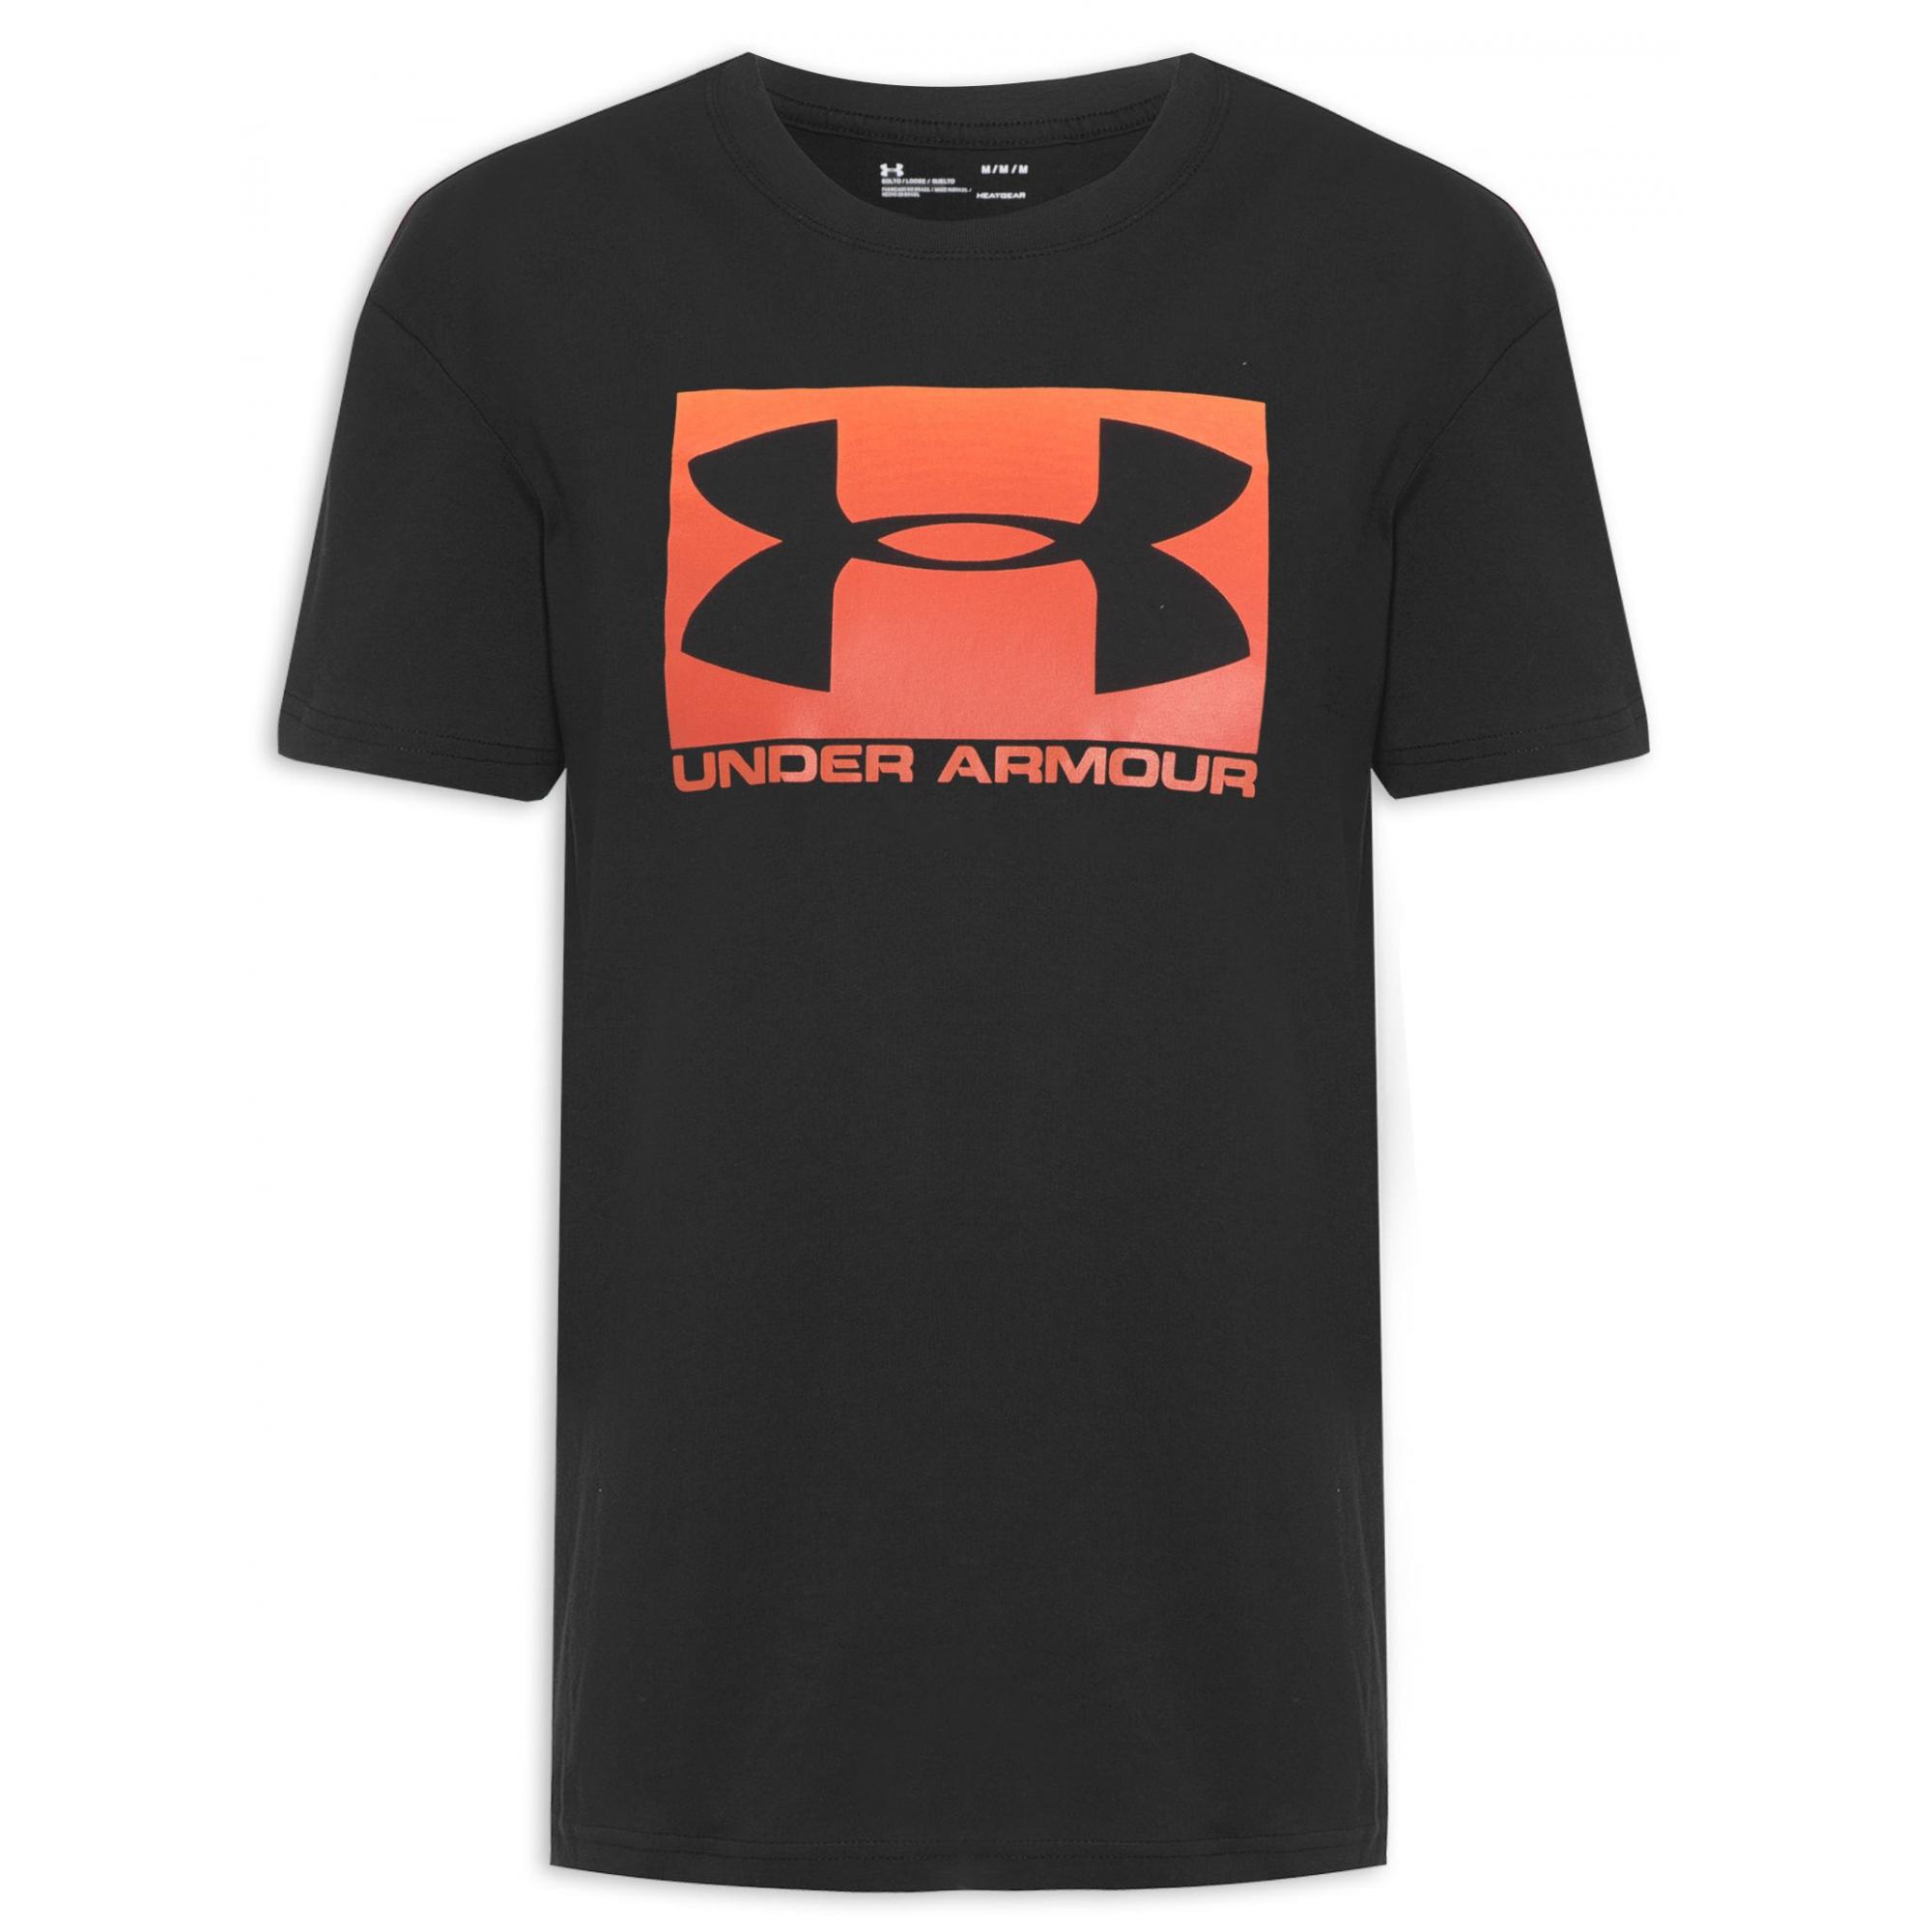 Camiseta Under Armour Boxed Sportstyle Latam Preto e Laranja